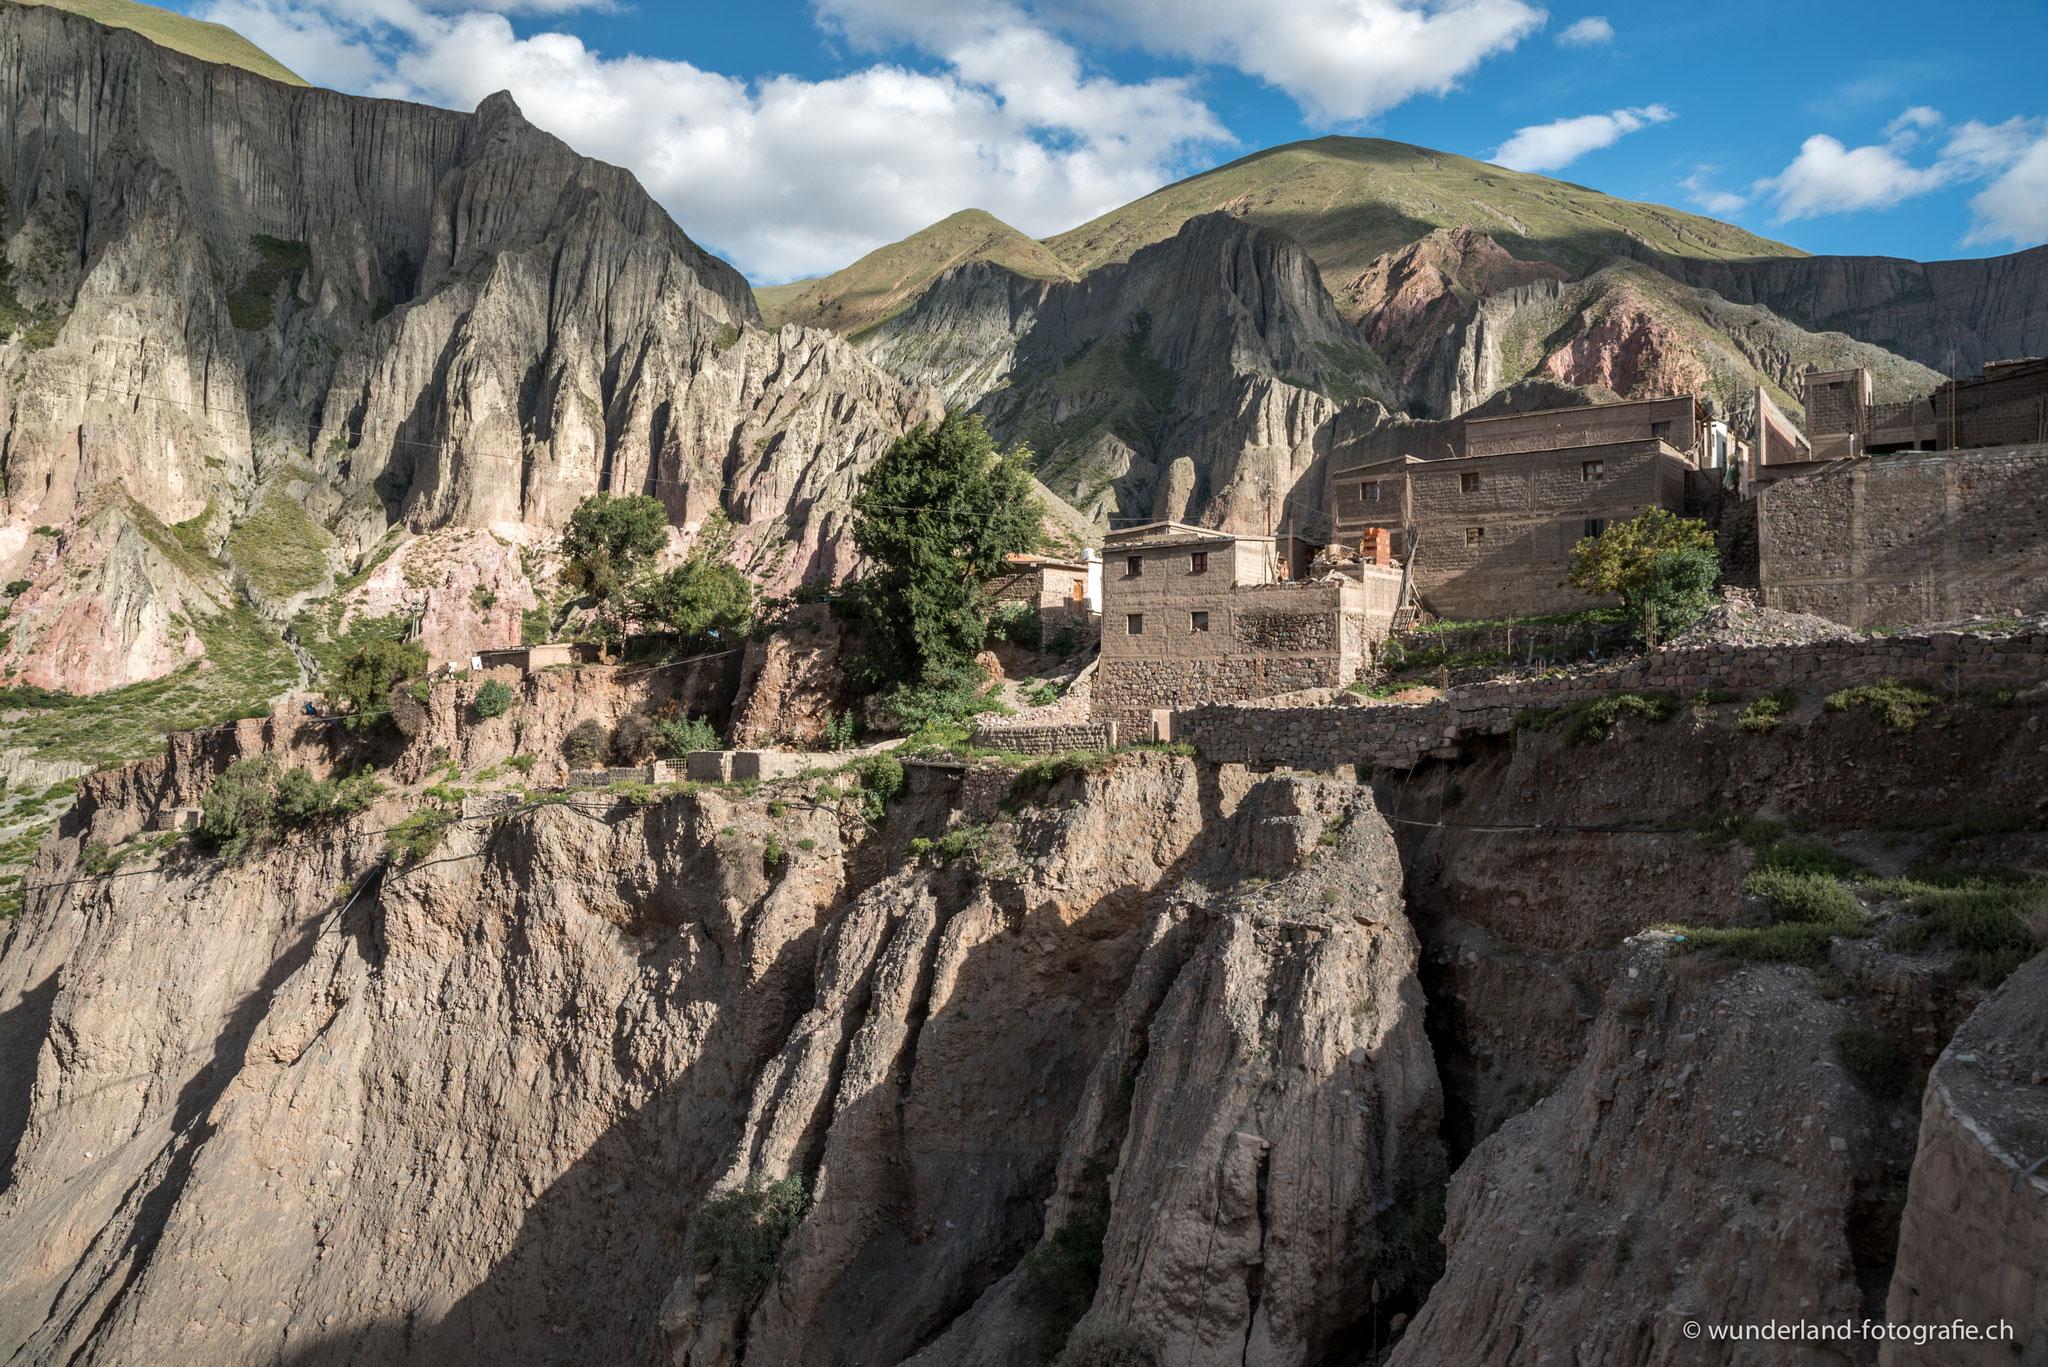 Das pittoreske Berdorf Iruya